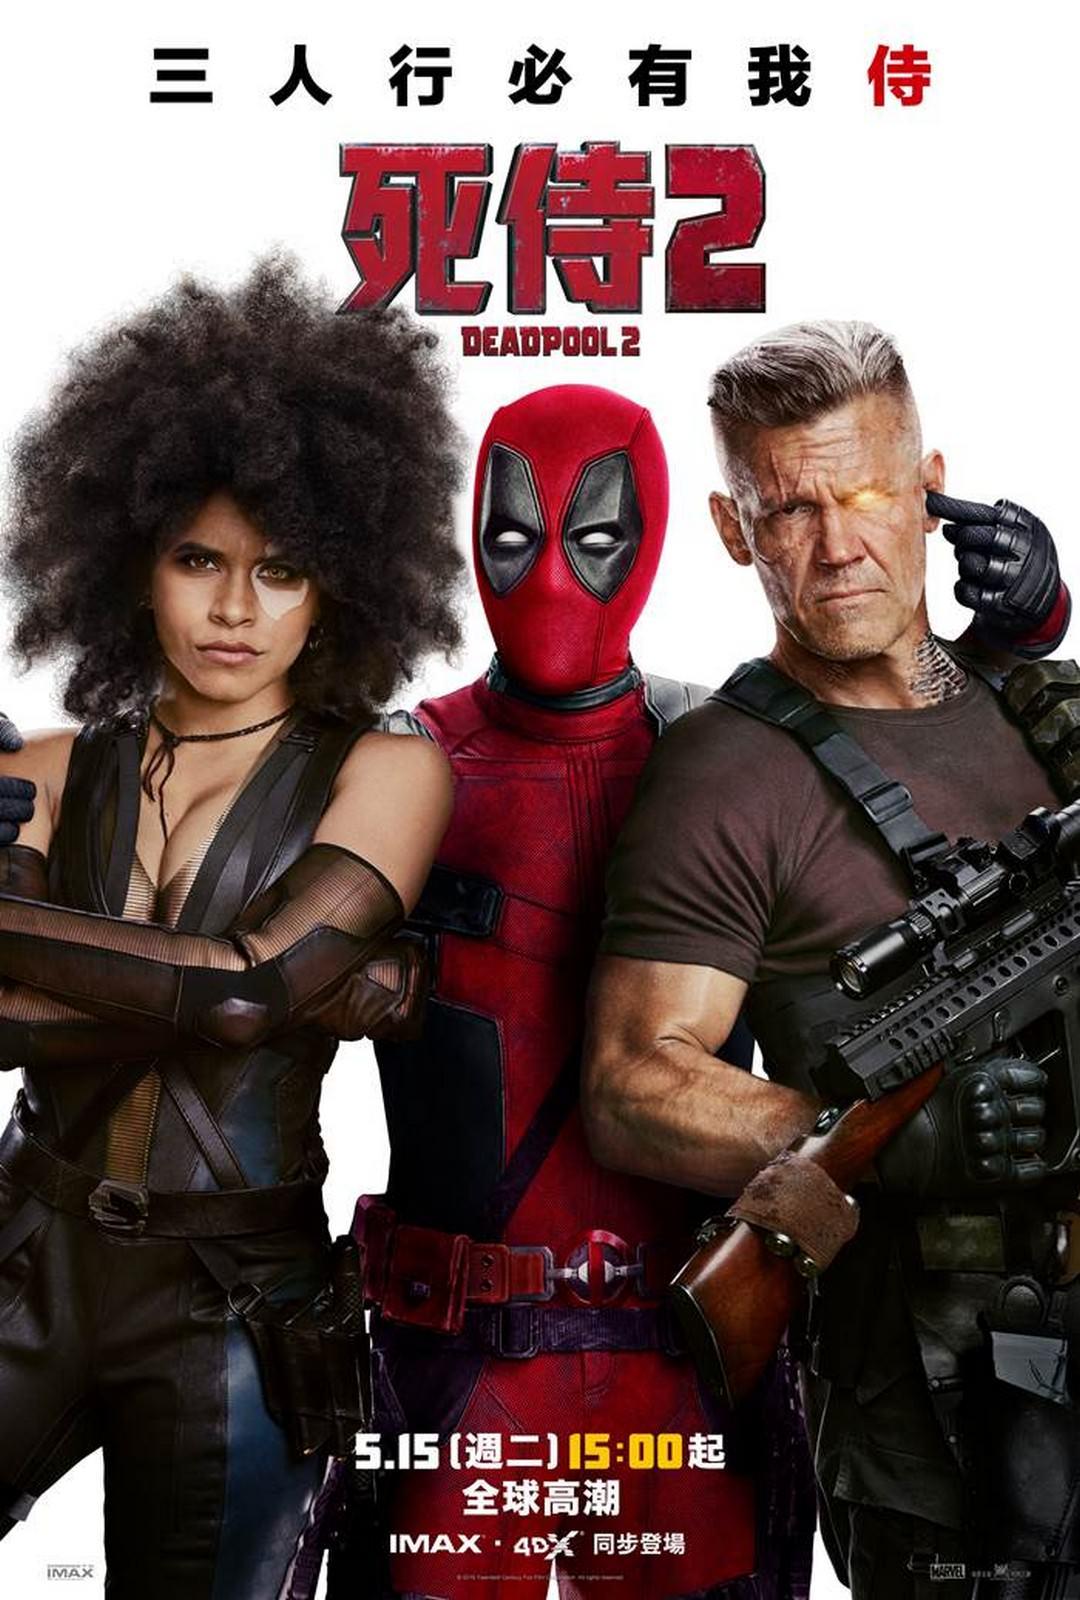 Movie, Deadpool 2(美國) / 死侍2(台.中.港), 電影海報, 台灣